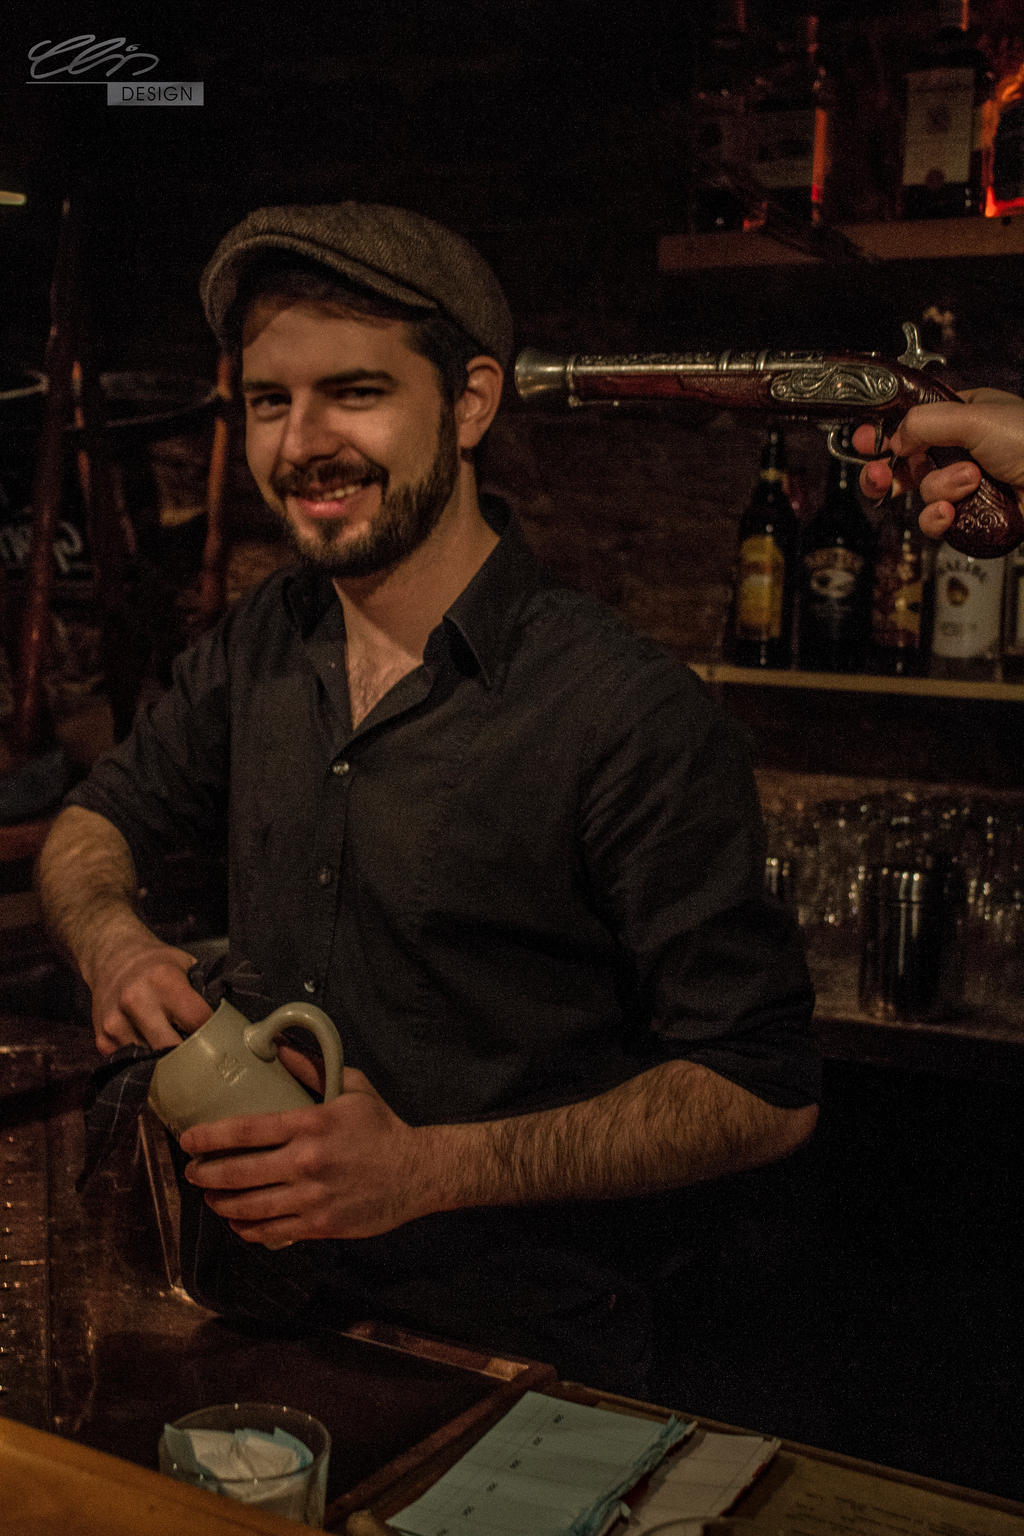 barkeepin.outtake by creativeIntoxication